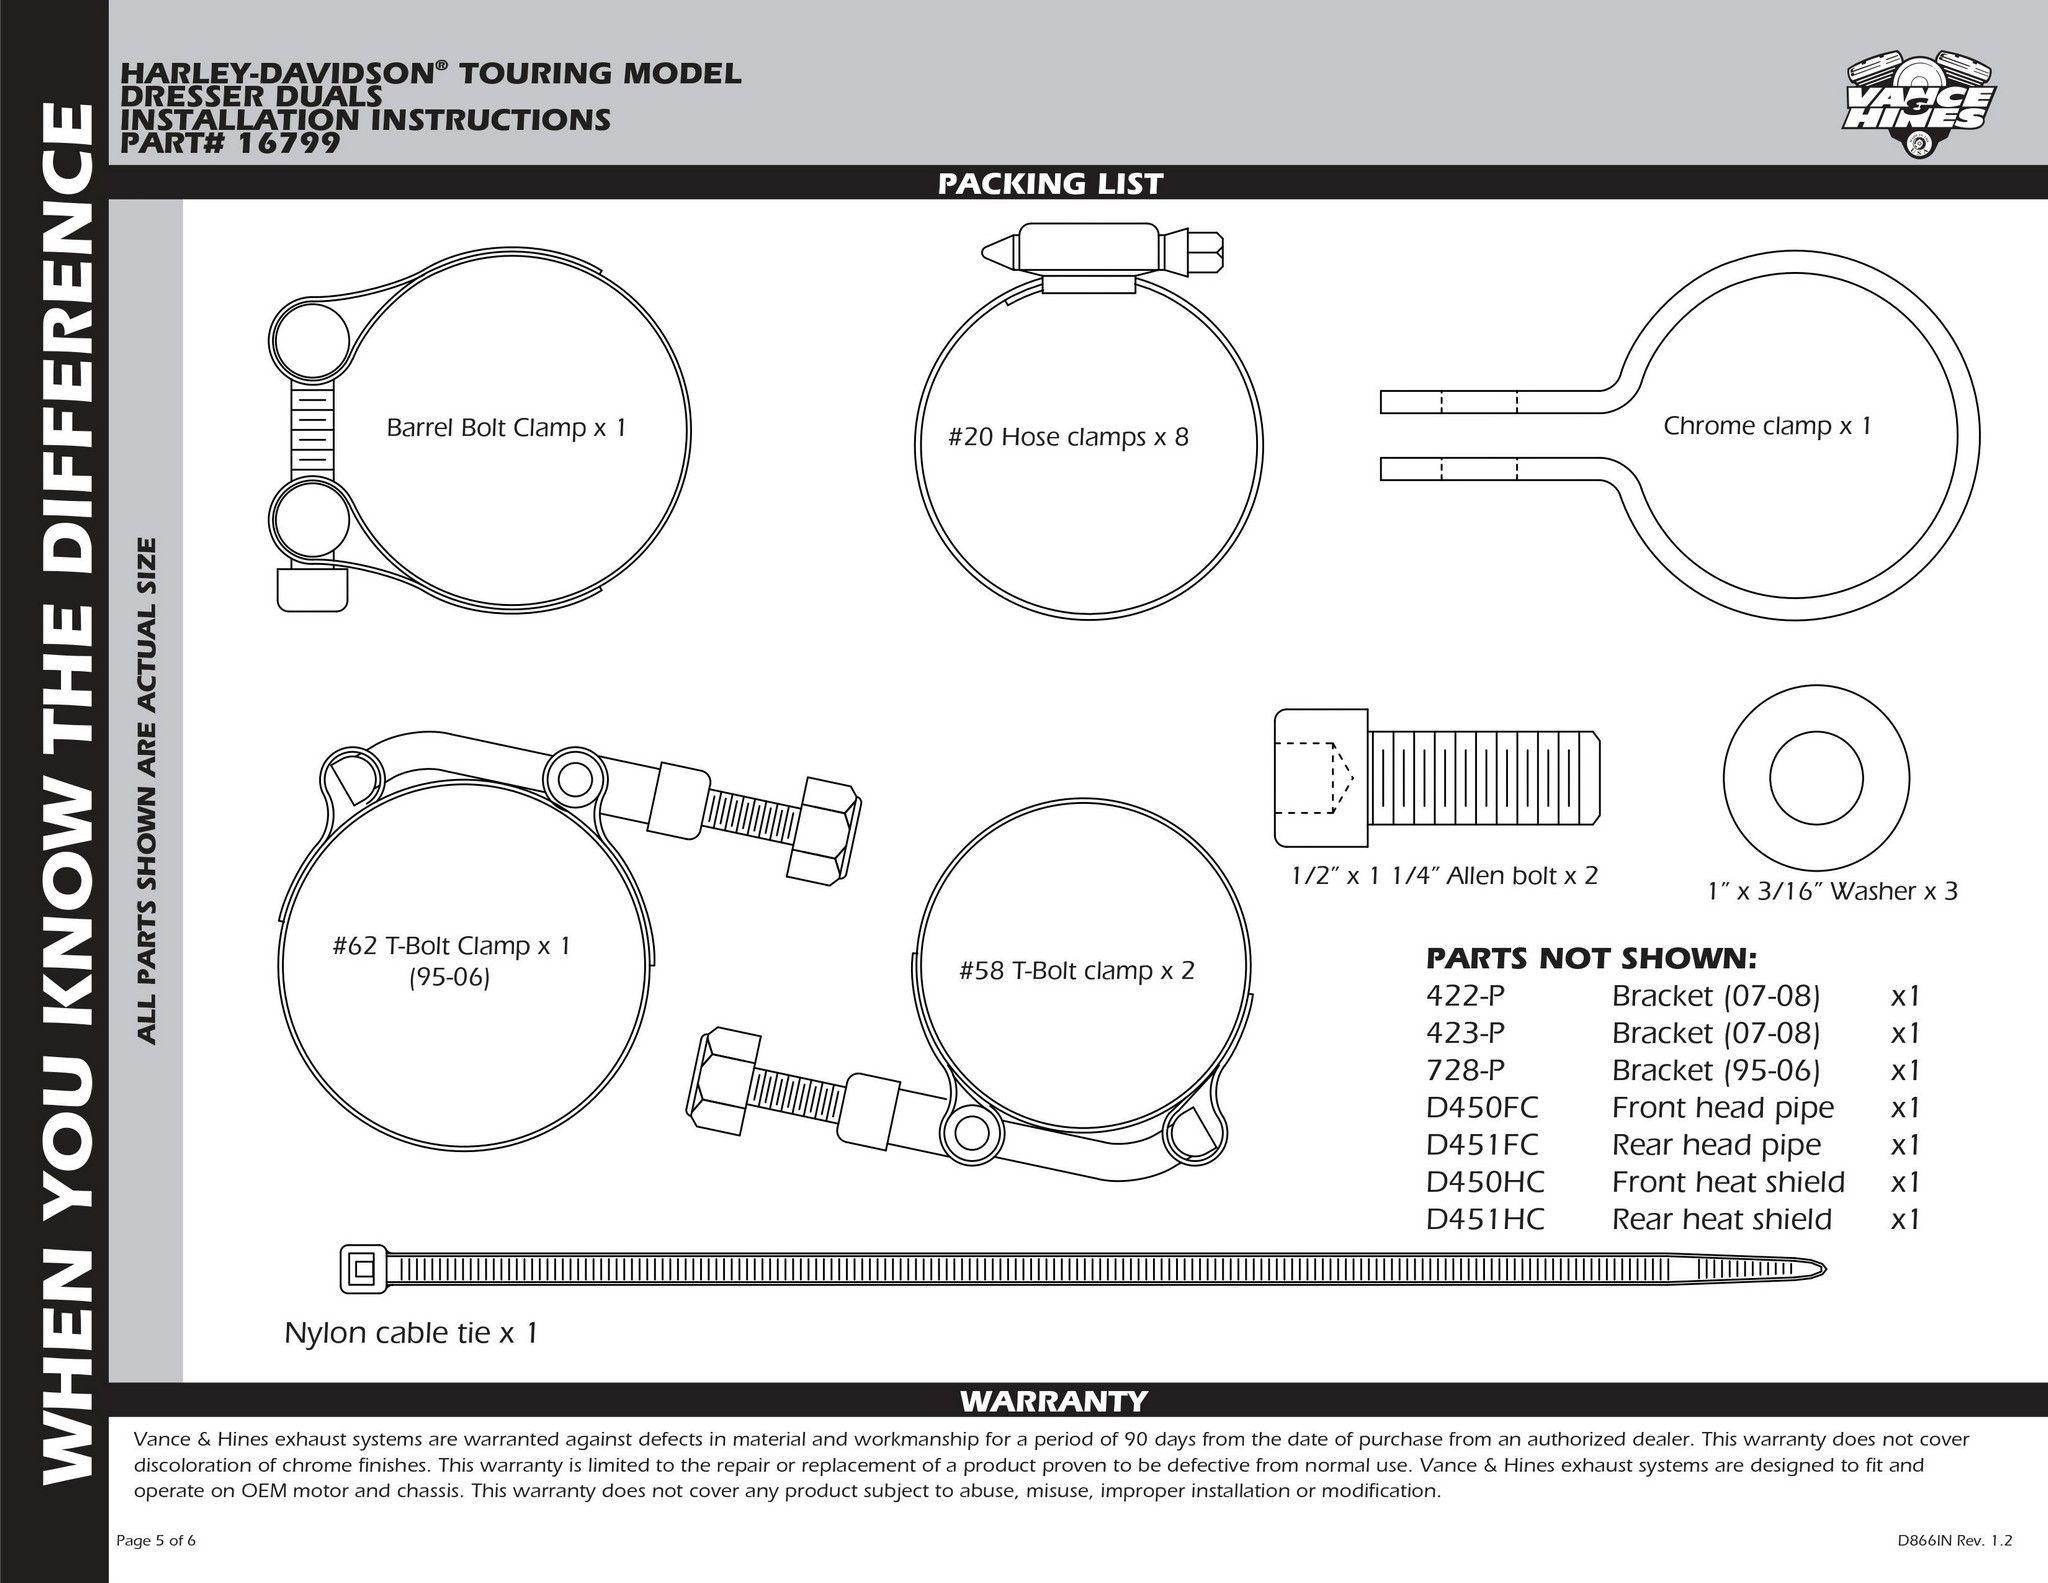 【VANCE&HINES】 DRESSER DUALS HEAD PIPES 排氣管頭段 - 「Webike-摩托百貨」